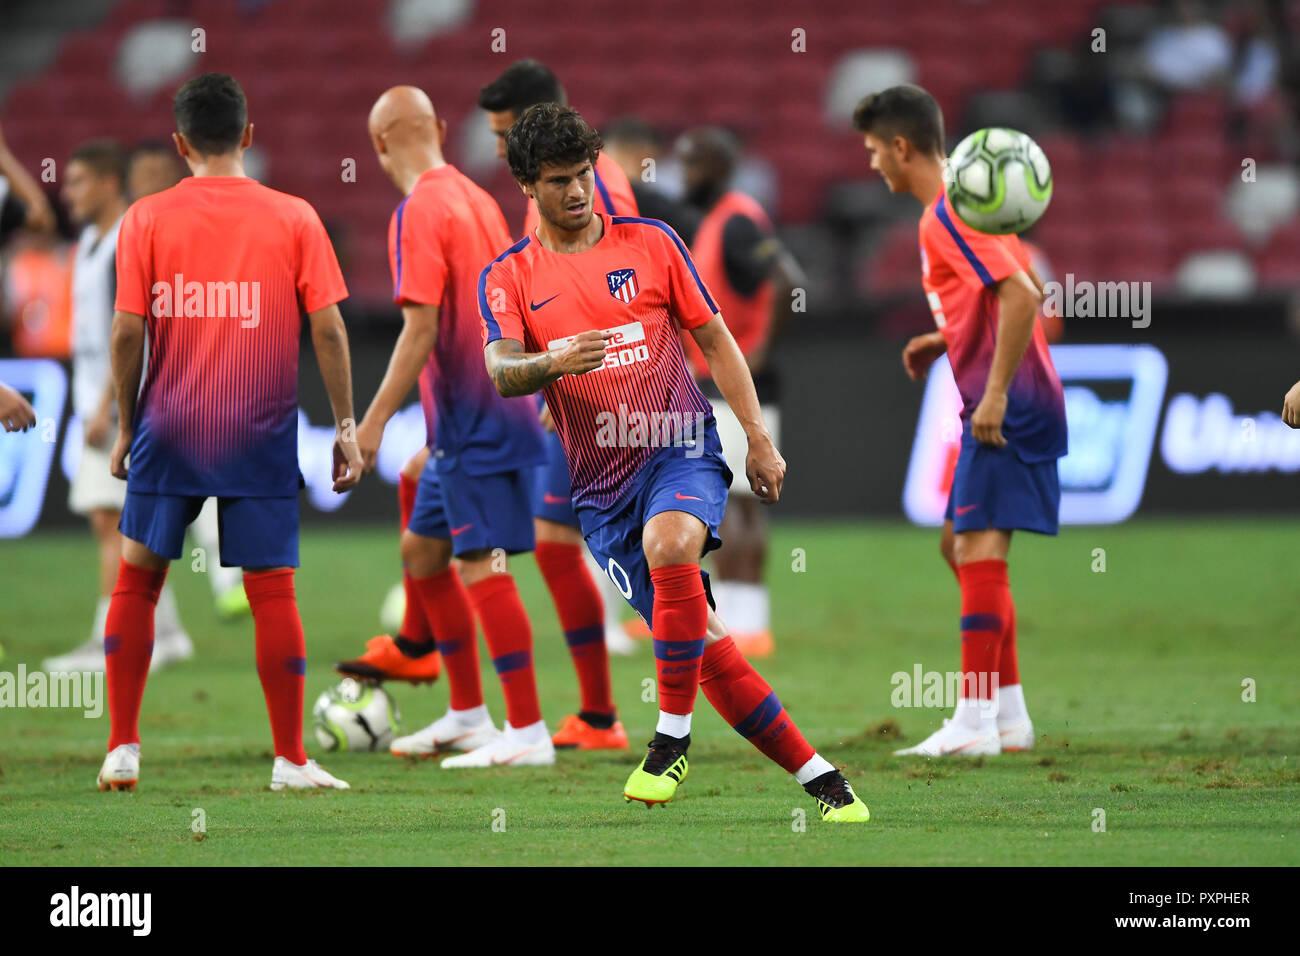 Kallang Singapore 30jul2018 Roberto Olabe 30 Player Of Atletico